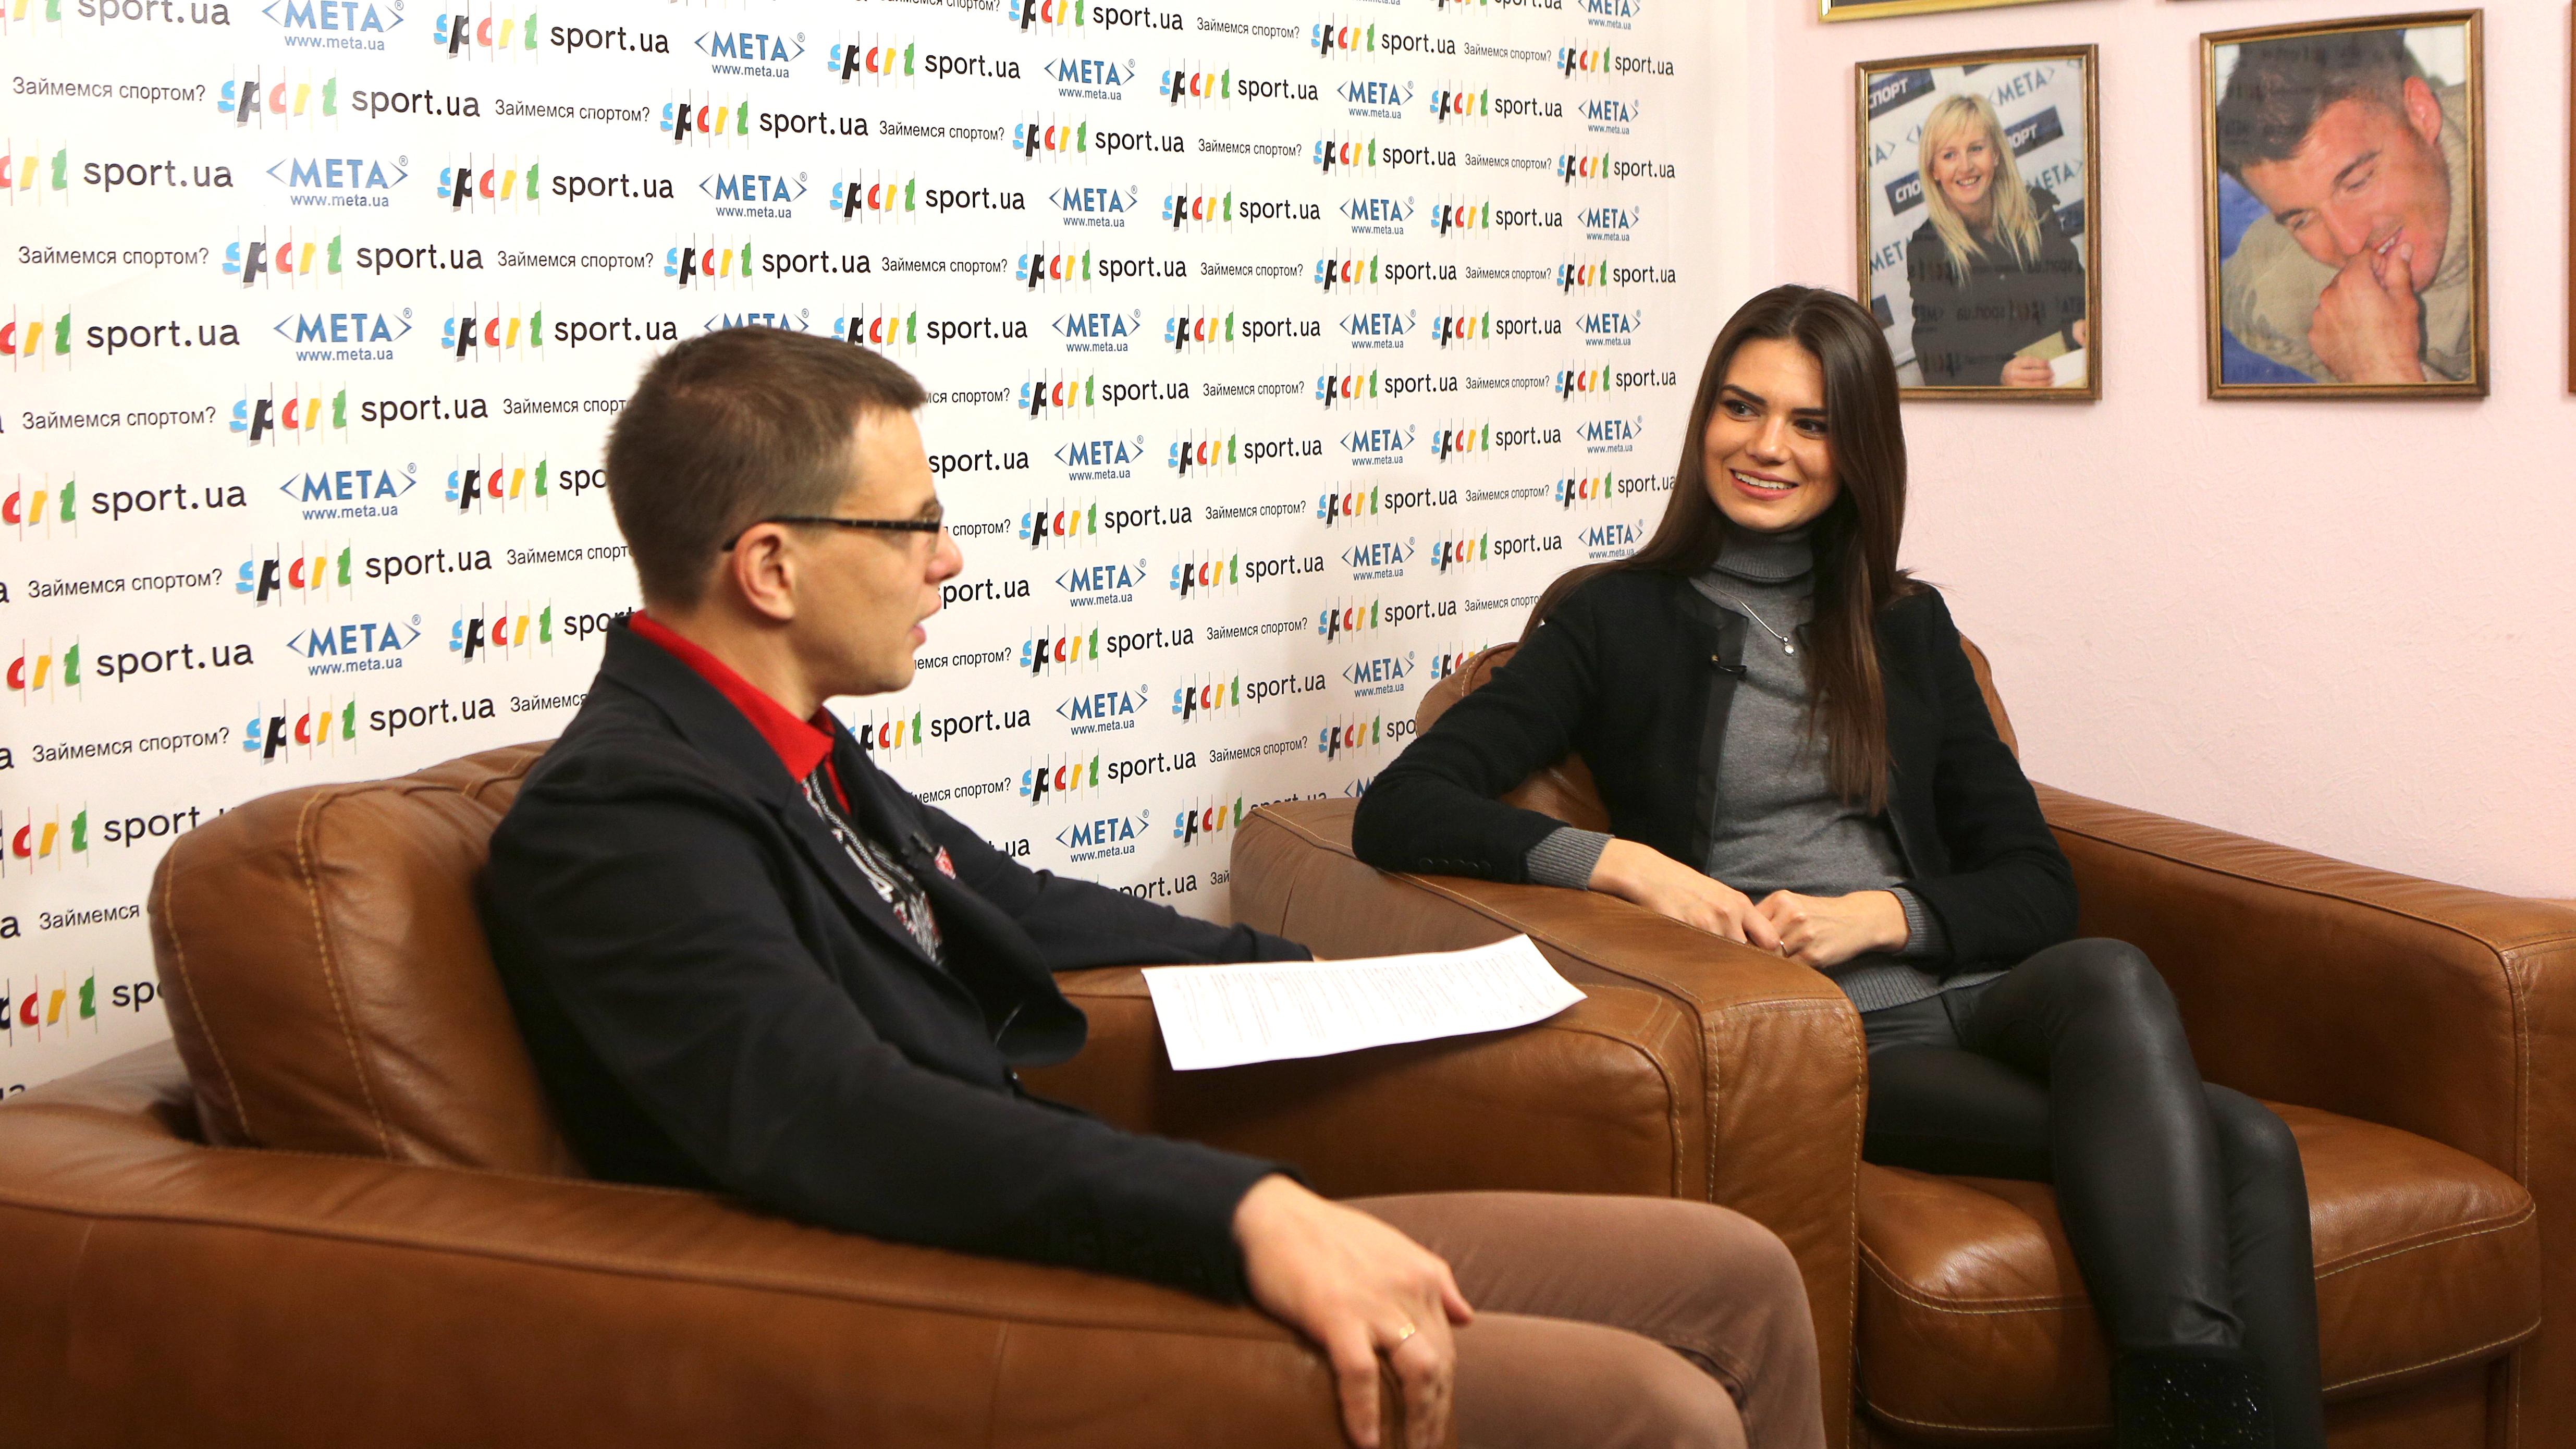 Олександра Лобода в гостях у редакції Sport.ua